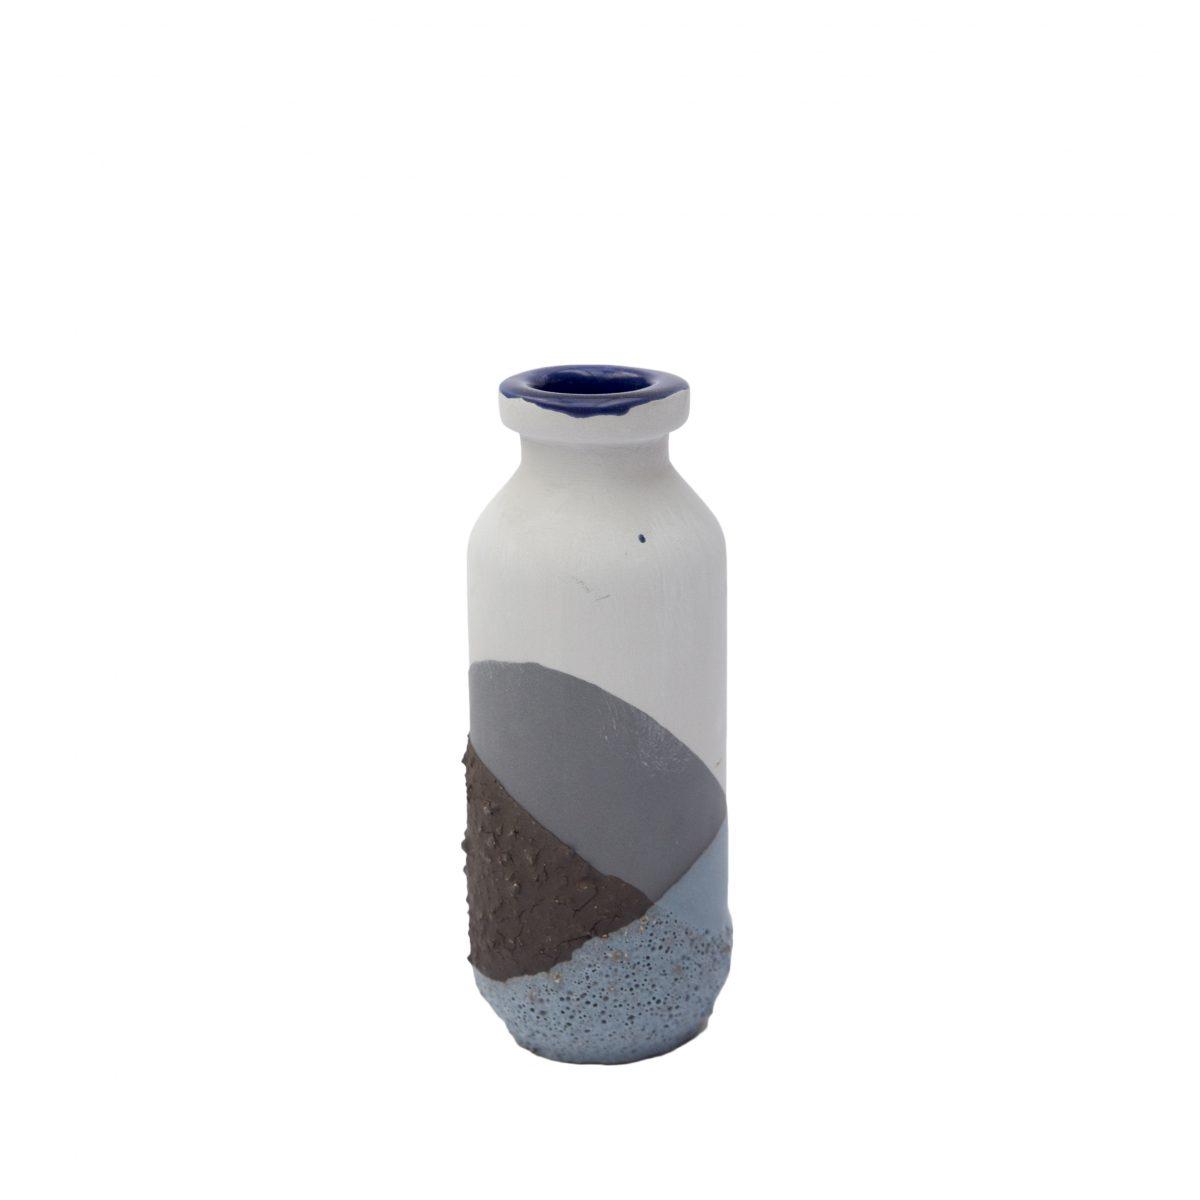 Plunge Vase small blauw blue Jeroen Wand Cor Unum